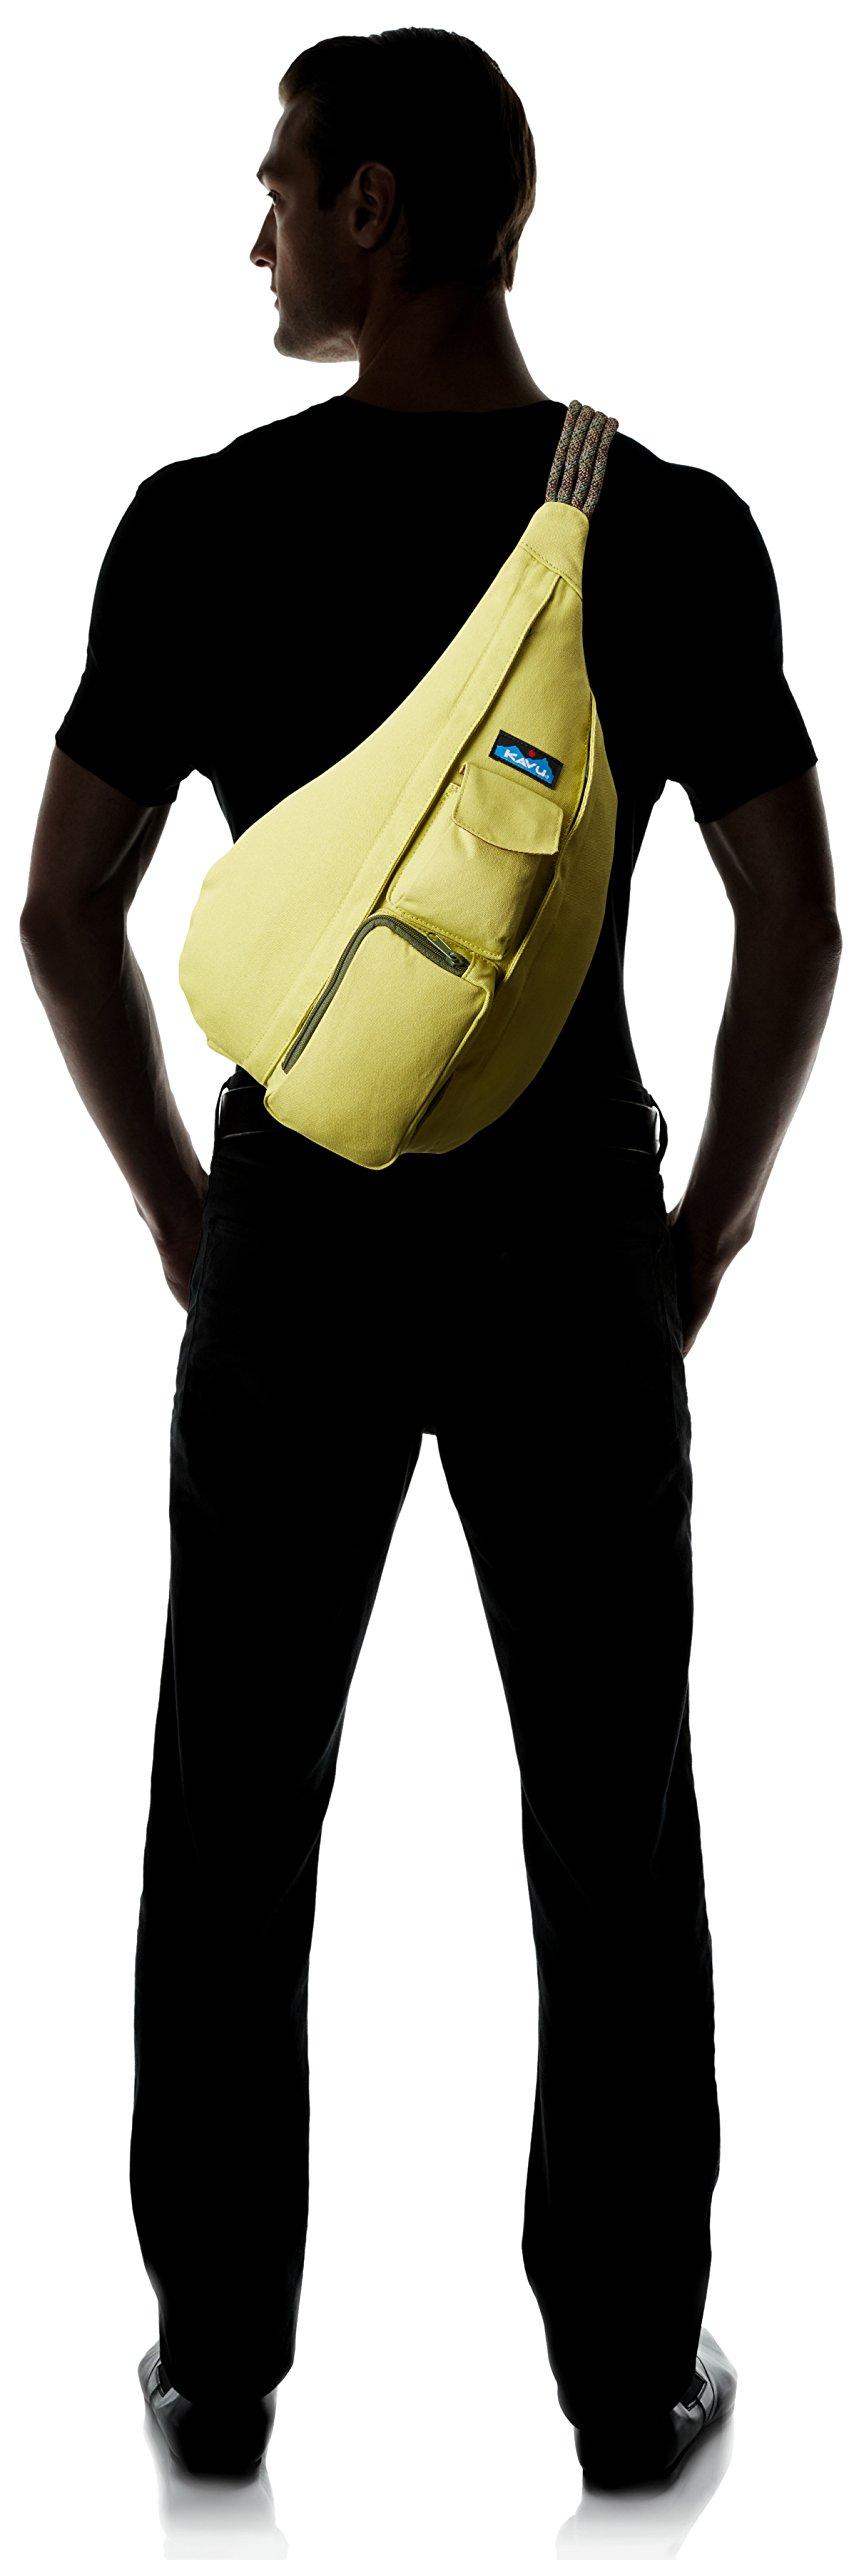 KAVU Rope Bag, Acid Green, One Size by KAVU (Image #4)